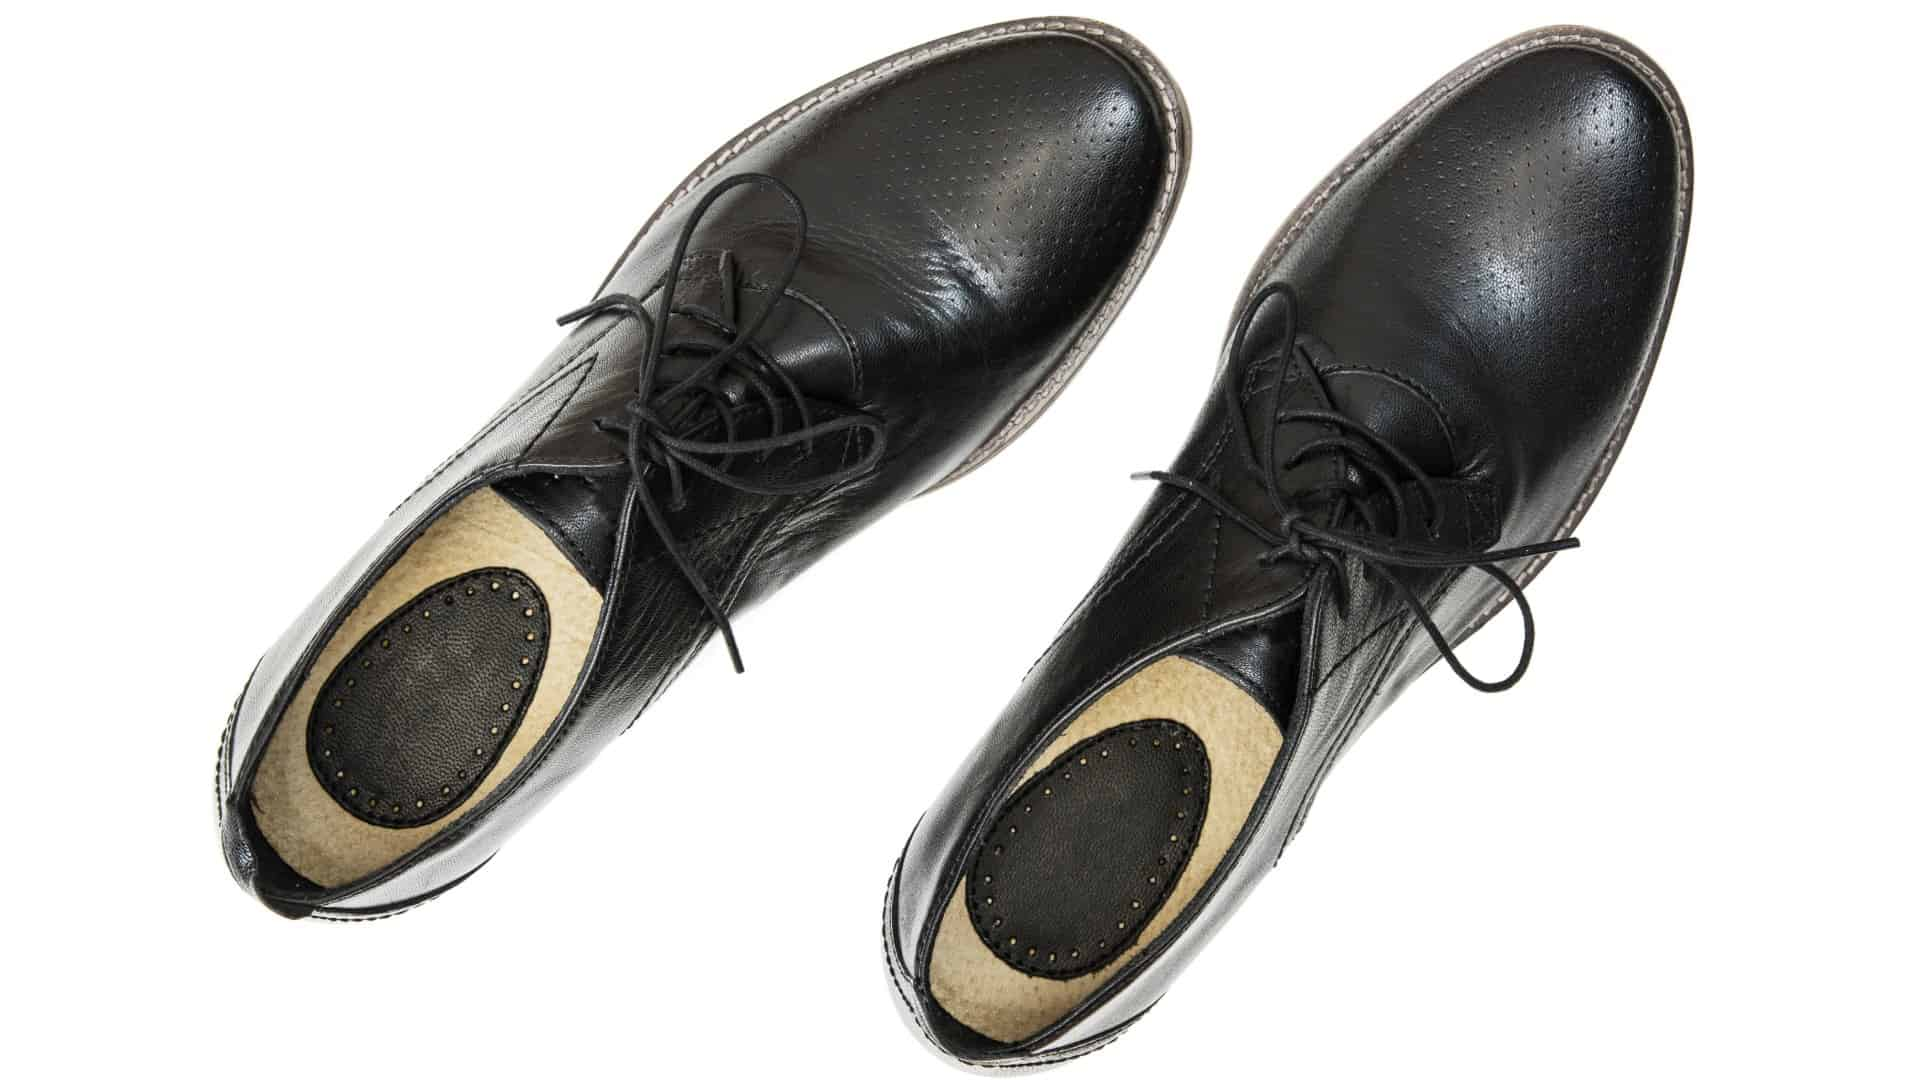 pair of men's business shoes